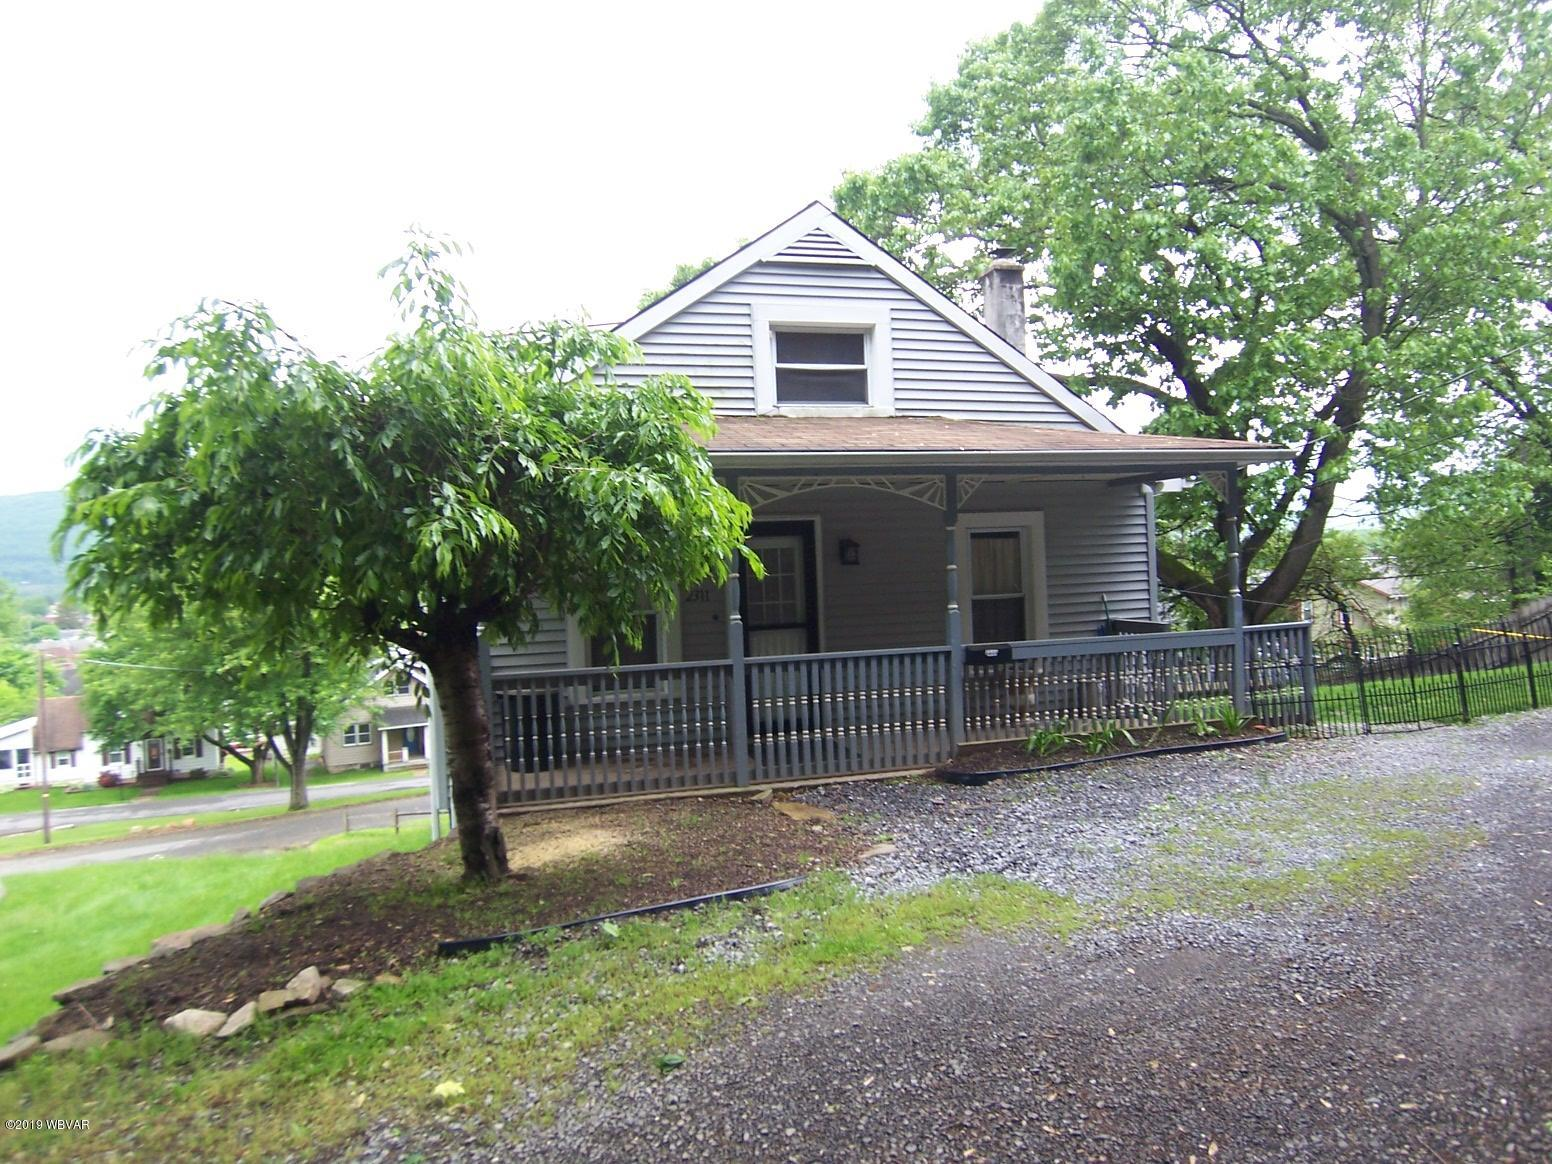 2311 HILLSIDE AVENUE,Williamsport,PA 17701,3 Bedrooms Bedrooms,1 BathroomBathrooms,Residential,HILLSIDE,WB-89850